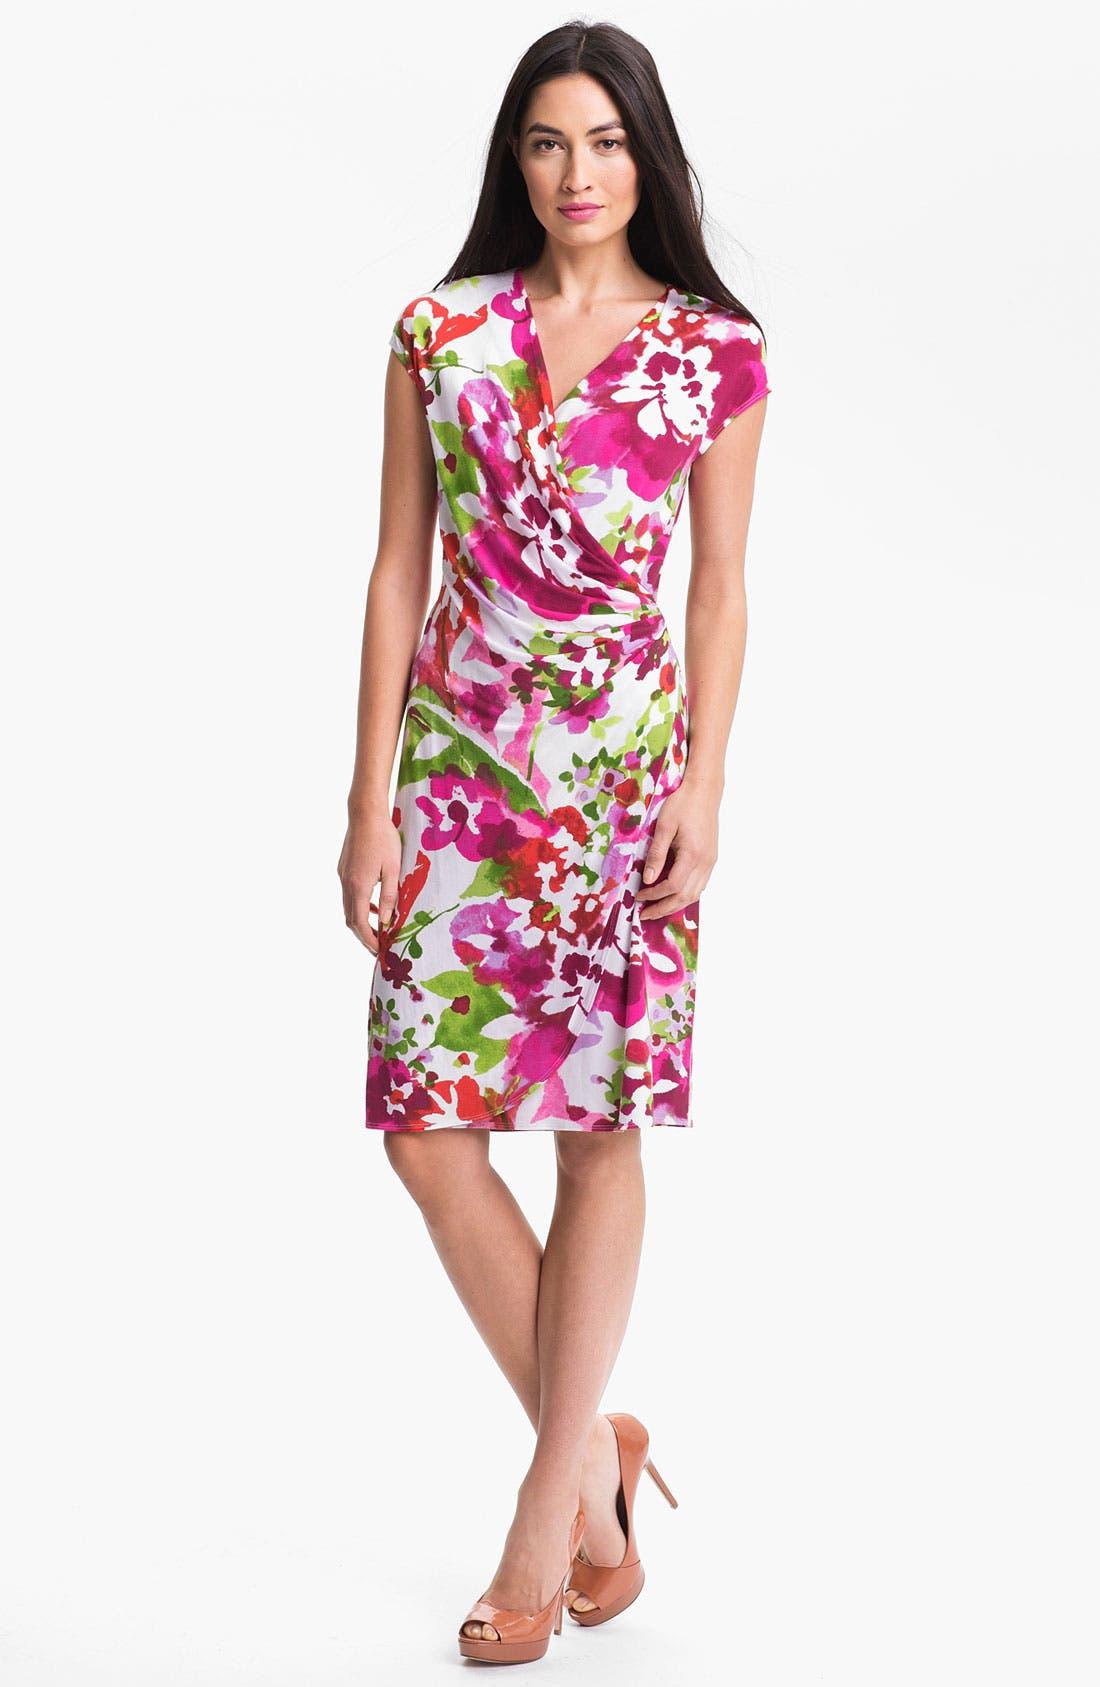 Main Image - Tommy Bahama 'Madcap A Floral' Dress